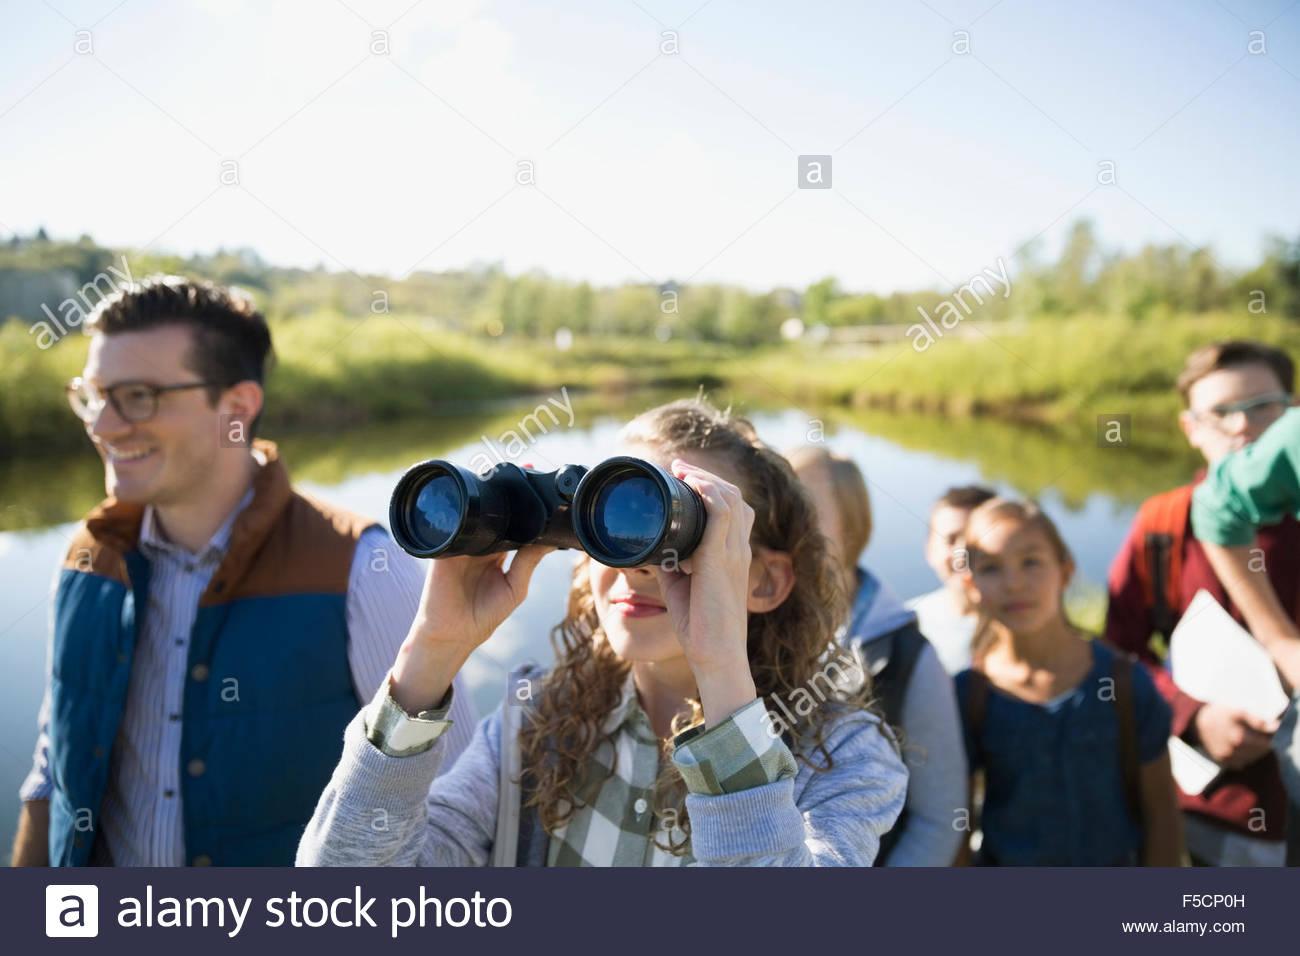 Curious schoolgirl with binoculars on field trip - Stock Image